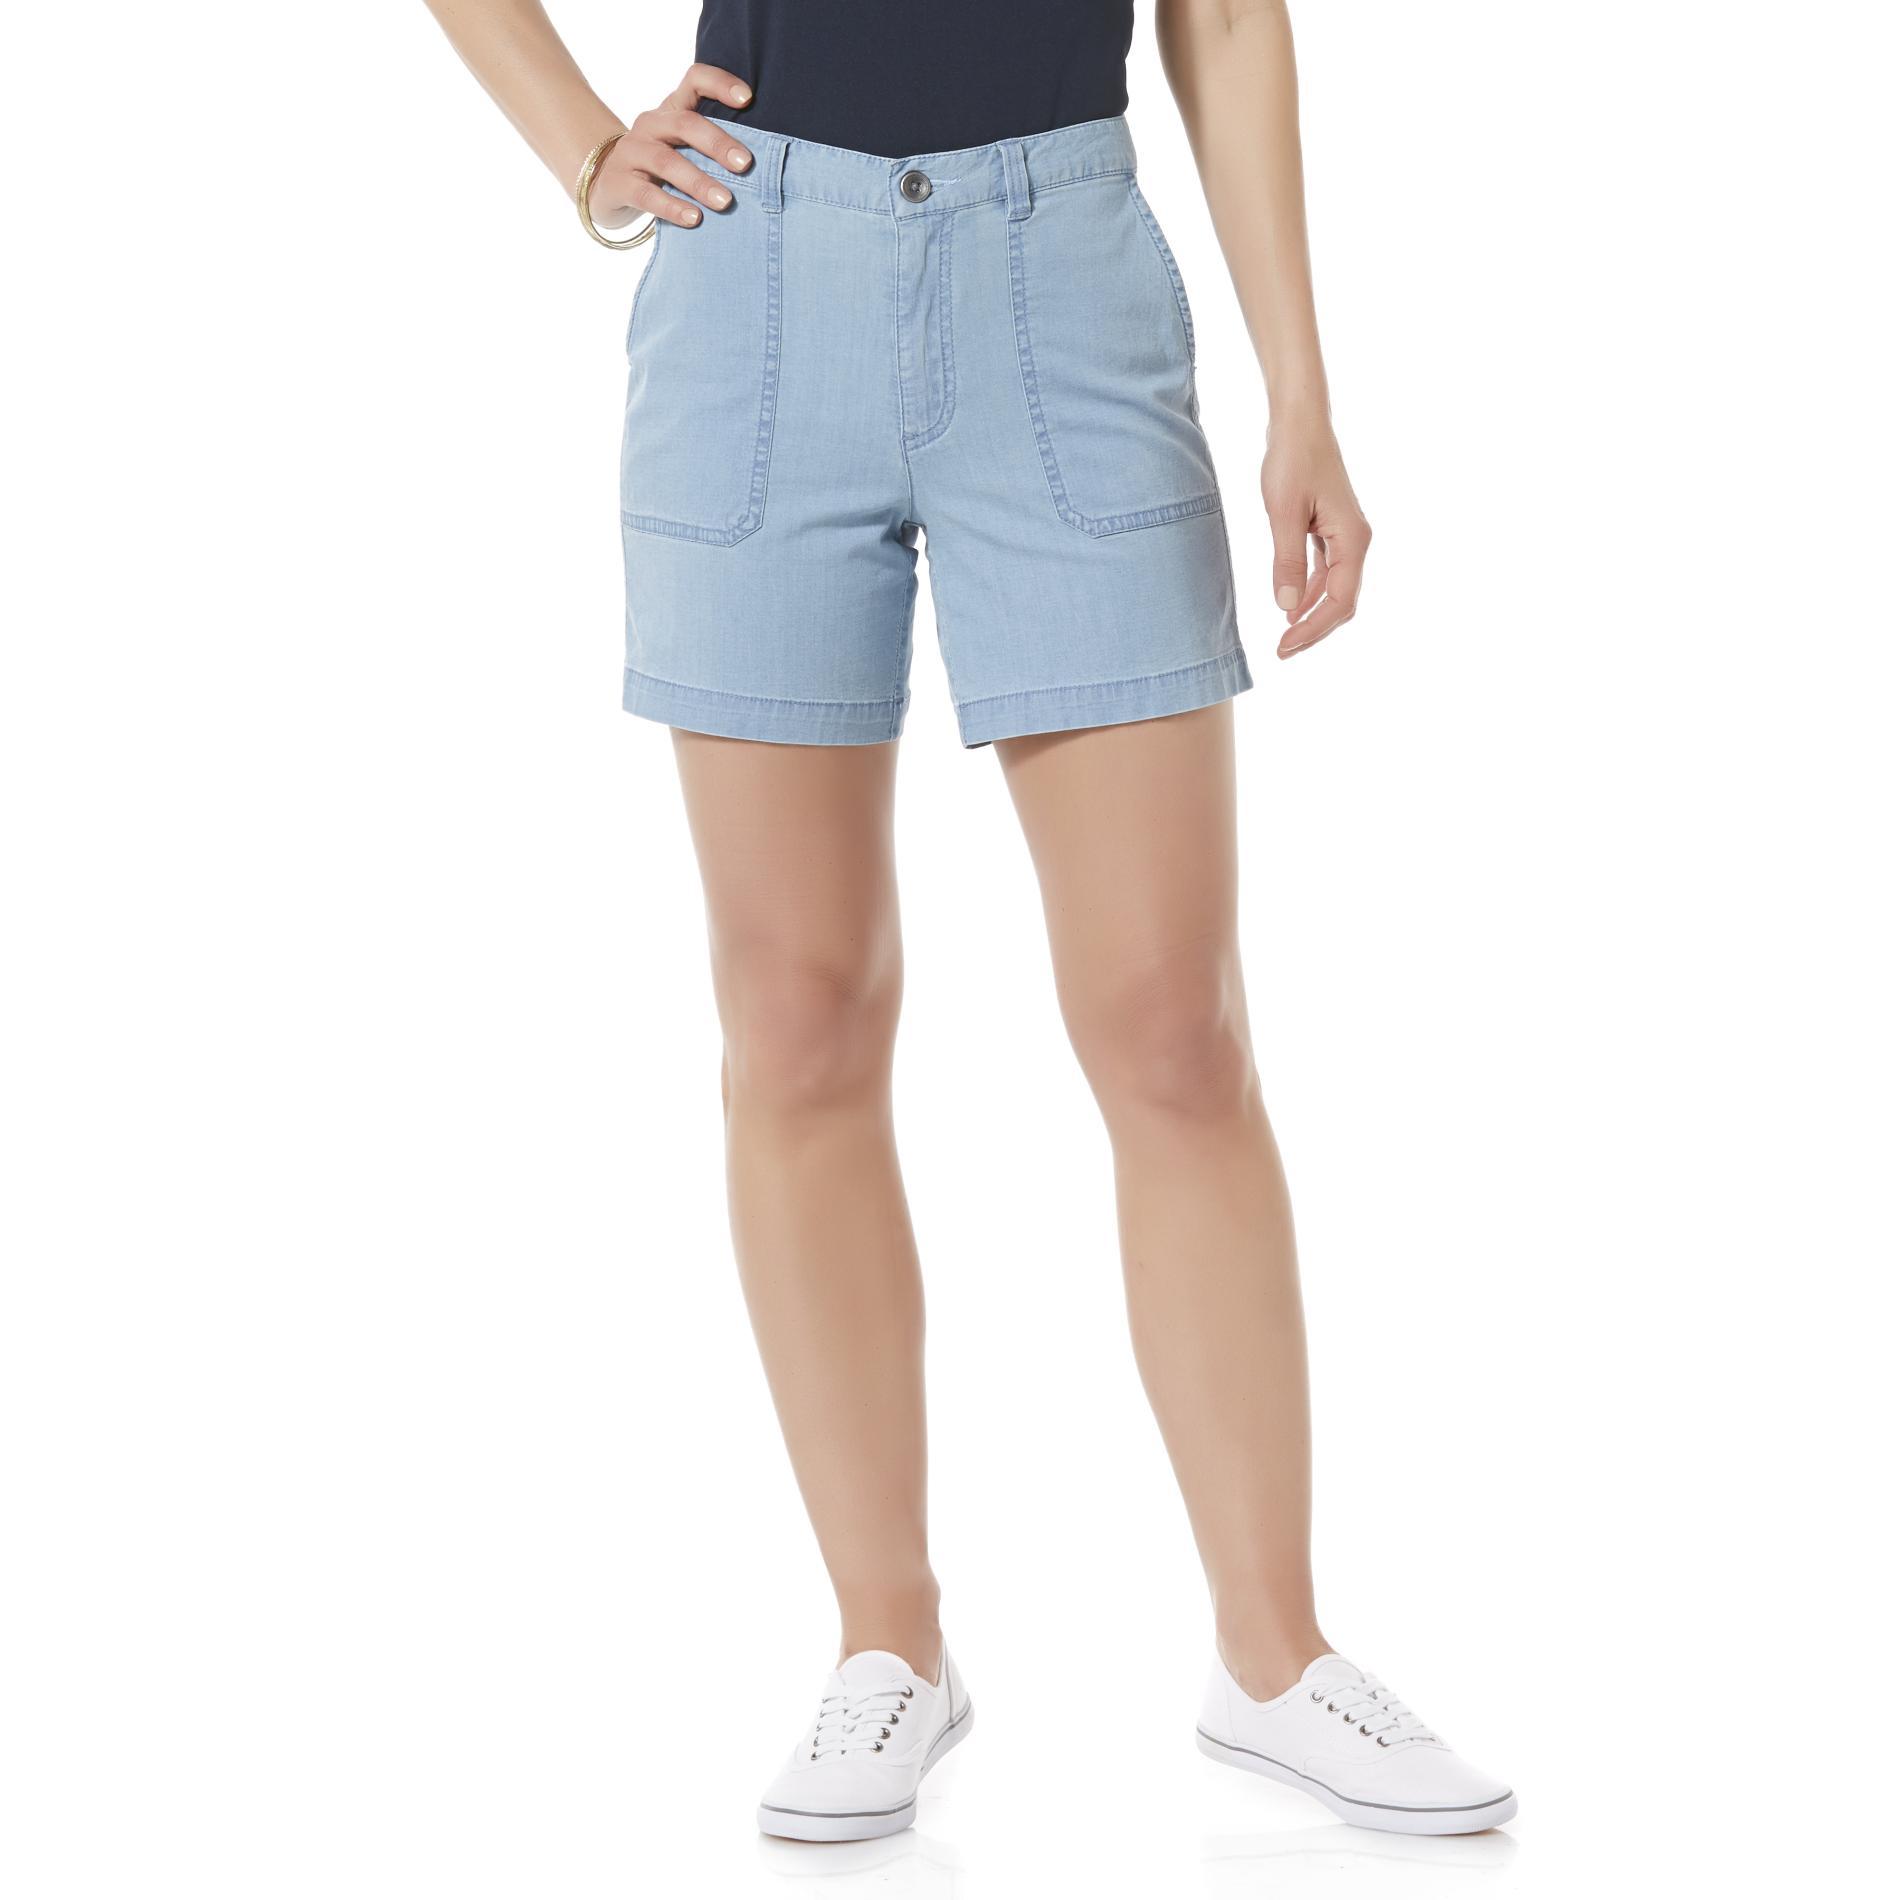 Basic Editions Women's Chambray Shorts